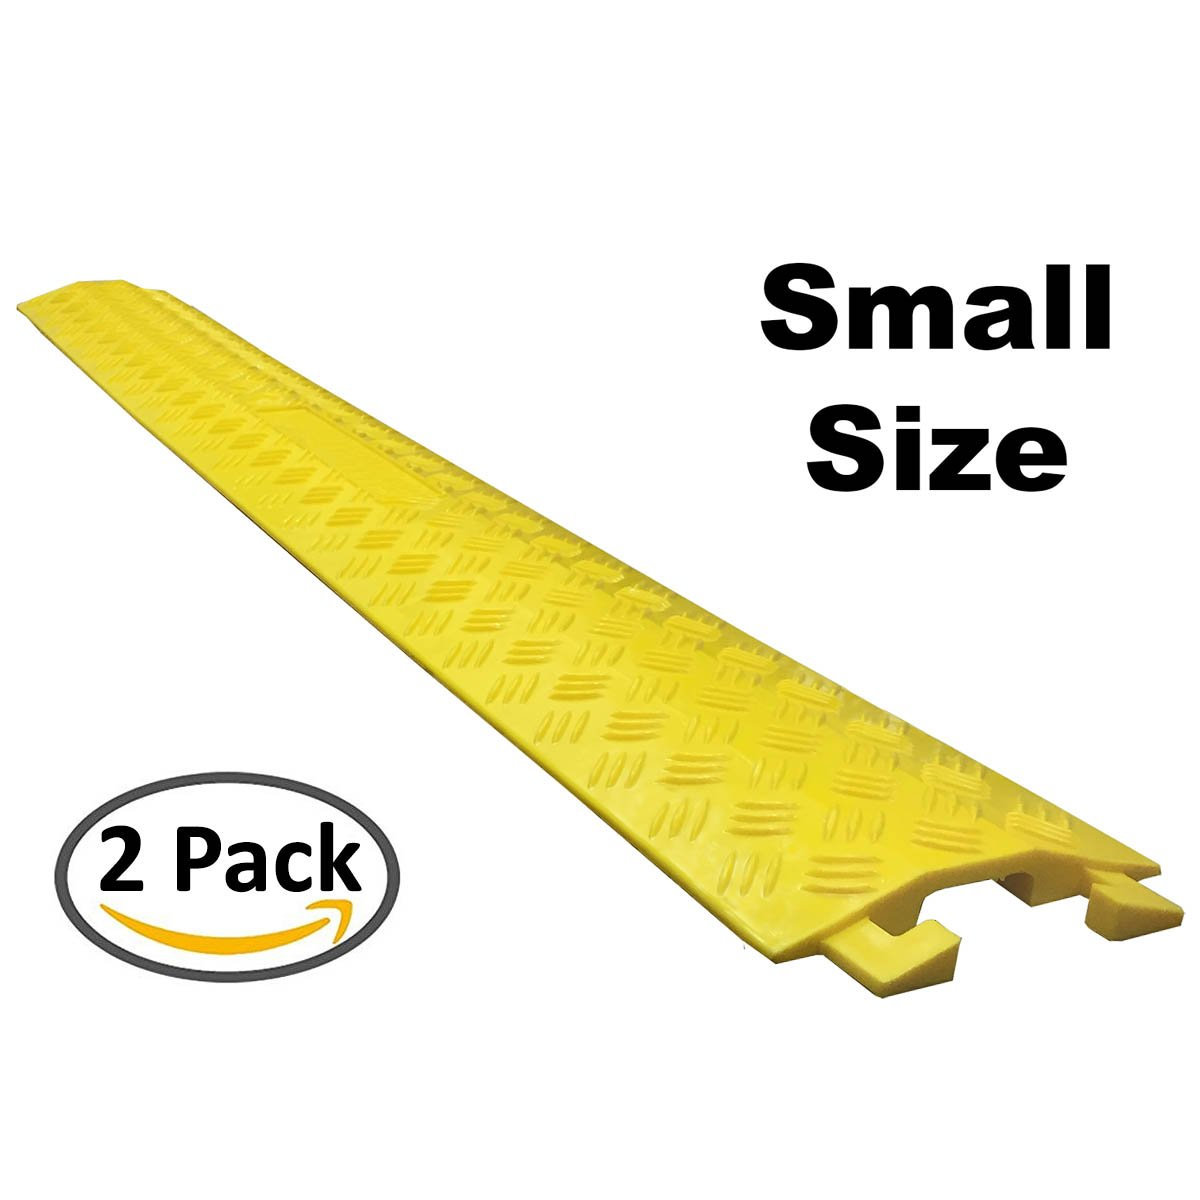 Drop Trak Cable /& Hose Protector Black Small